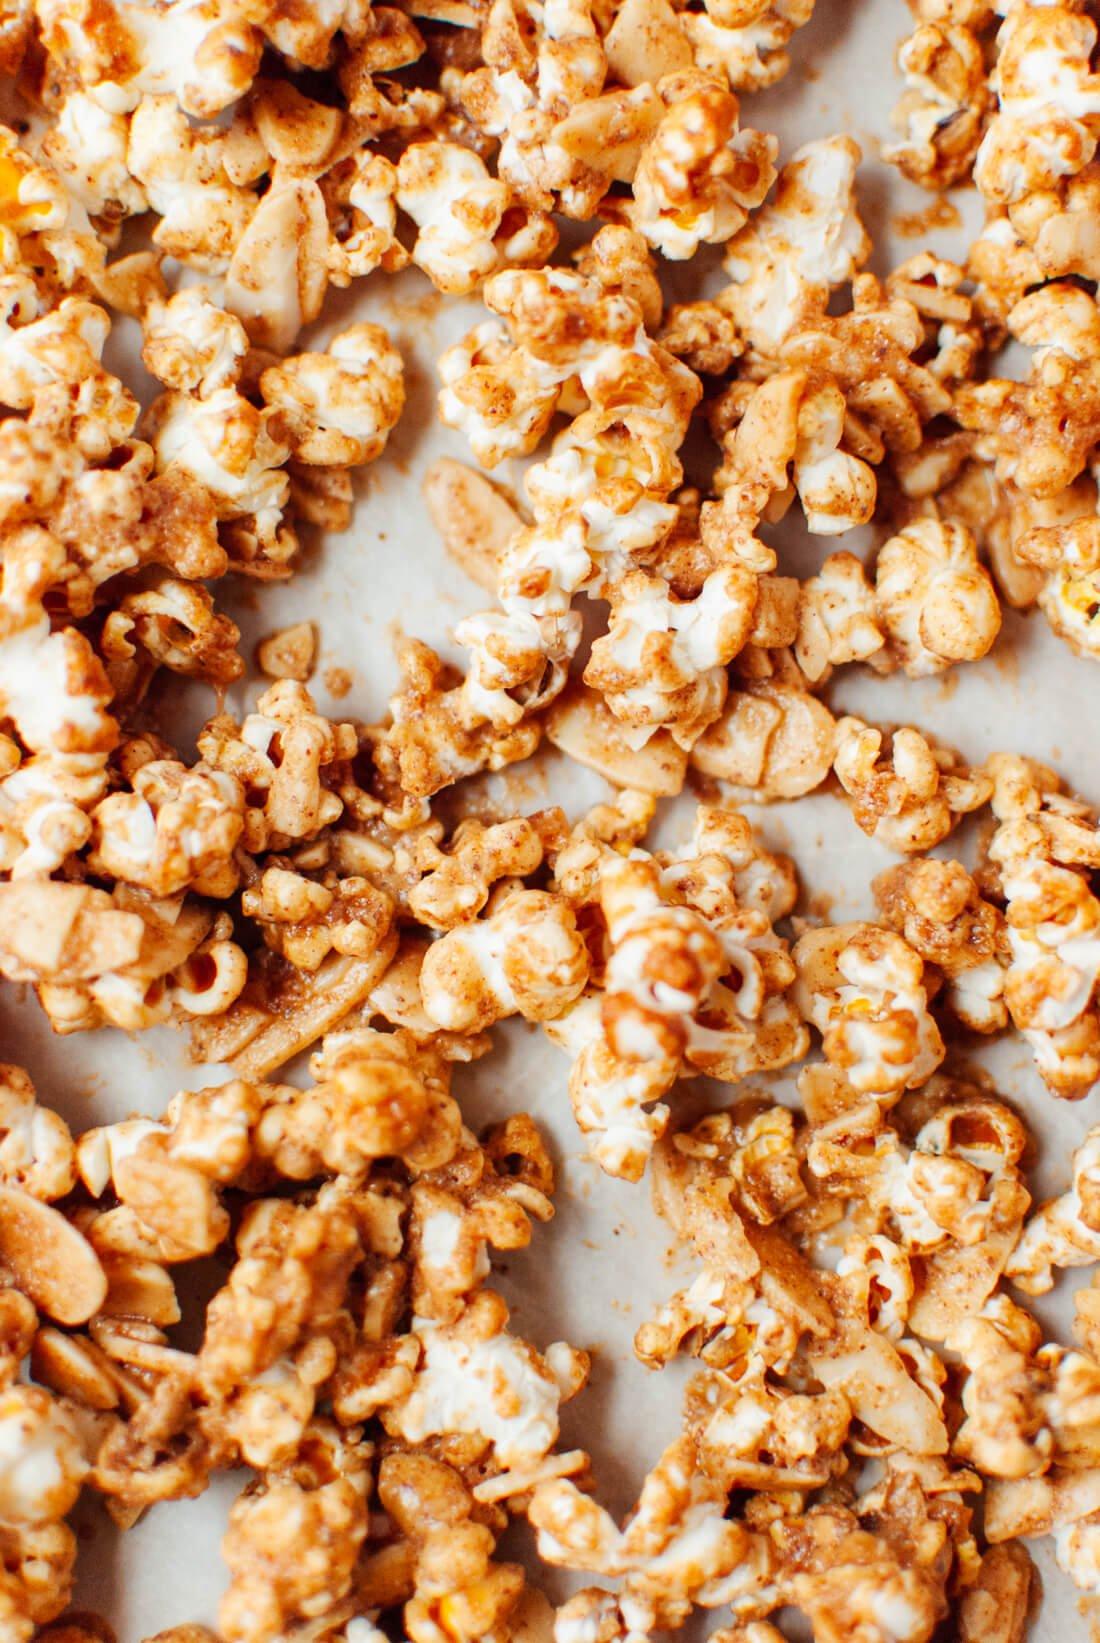 Healthy caramel popcorn recipe